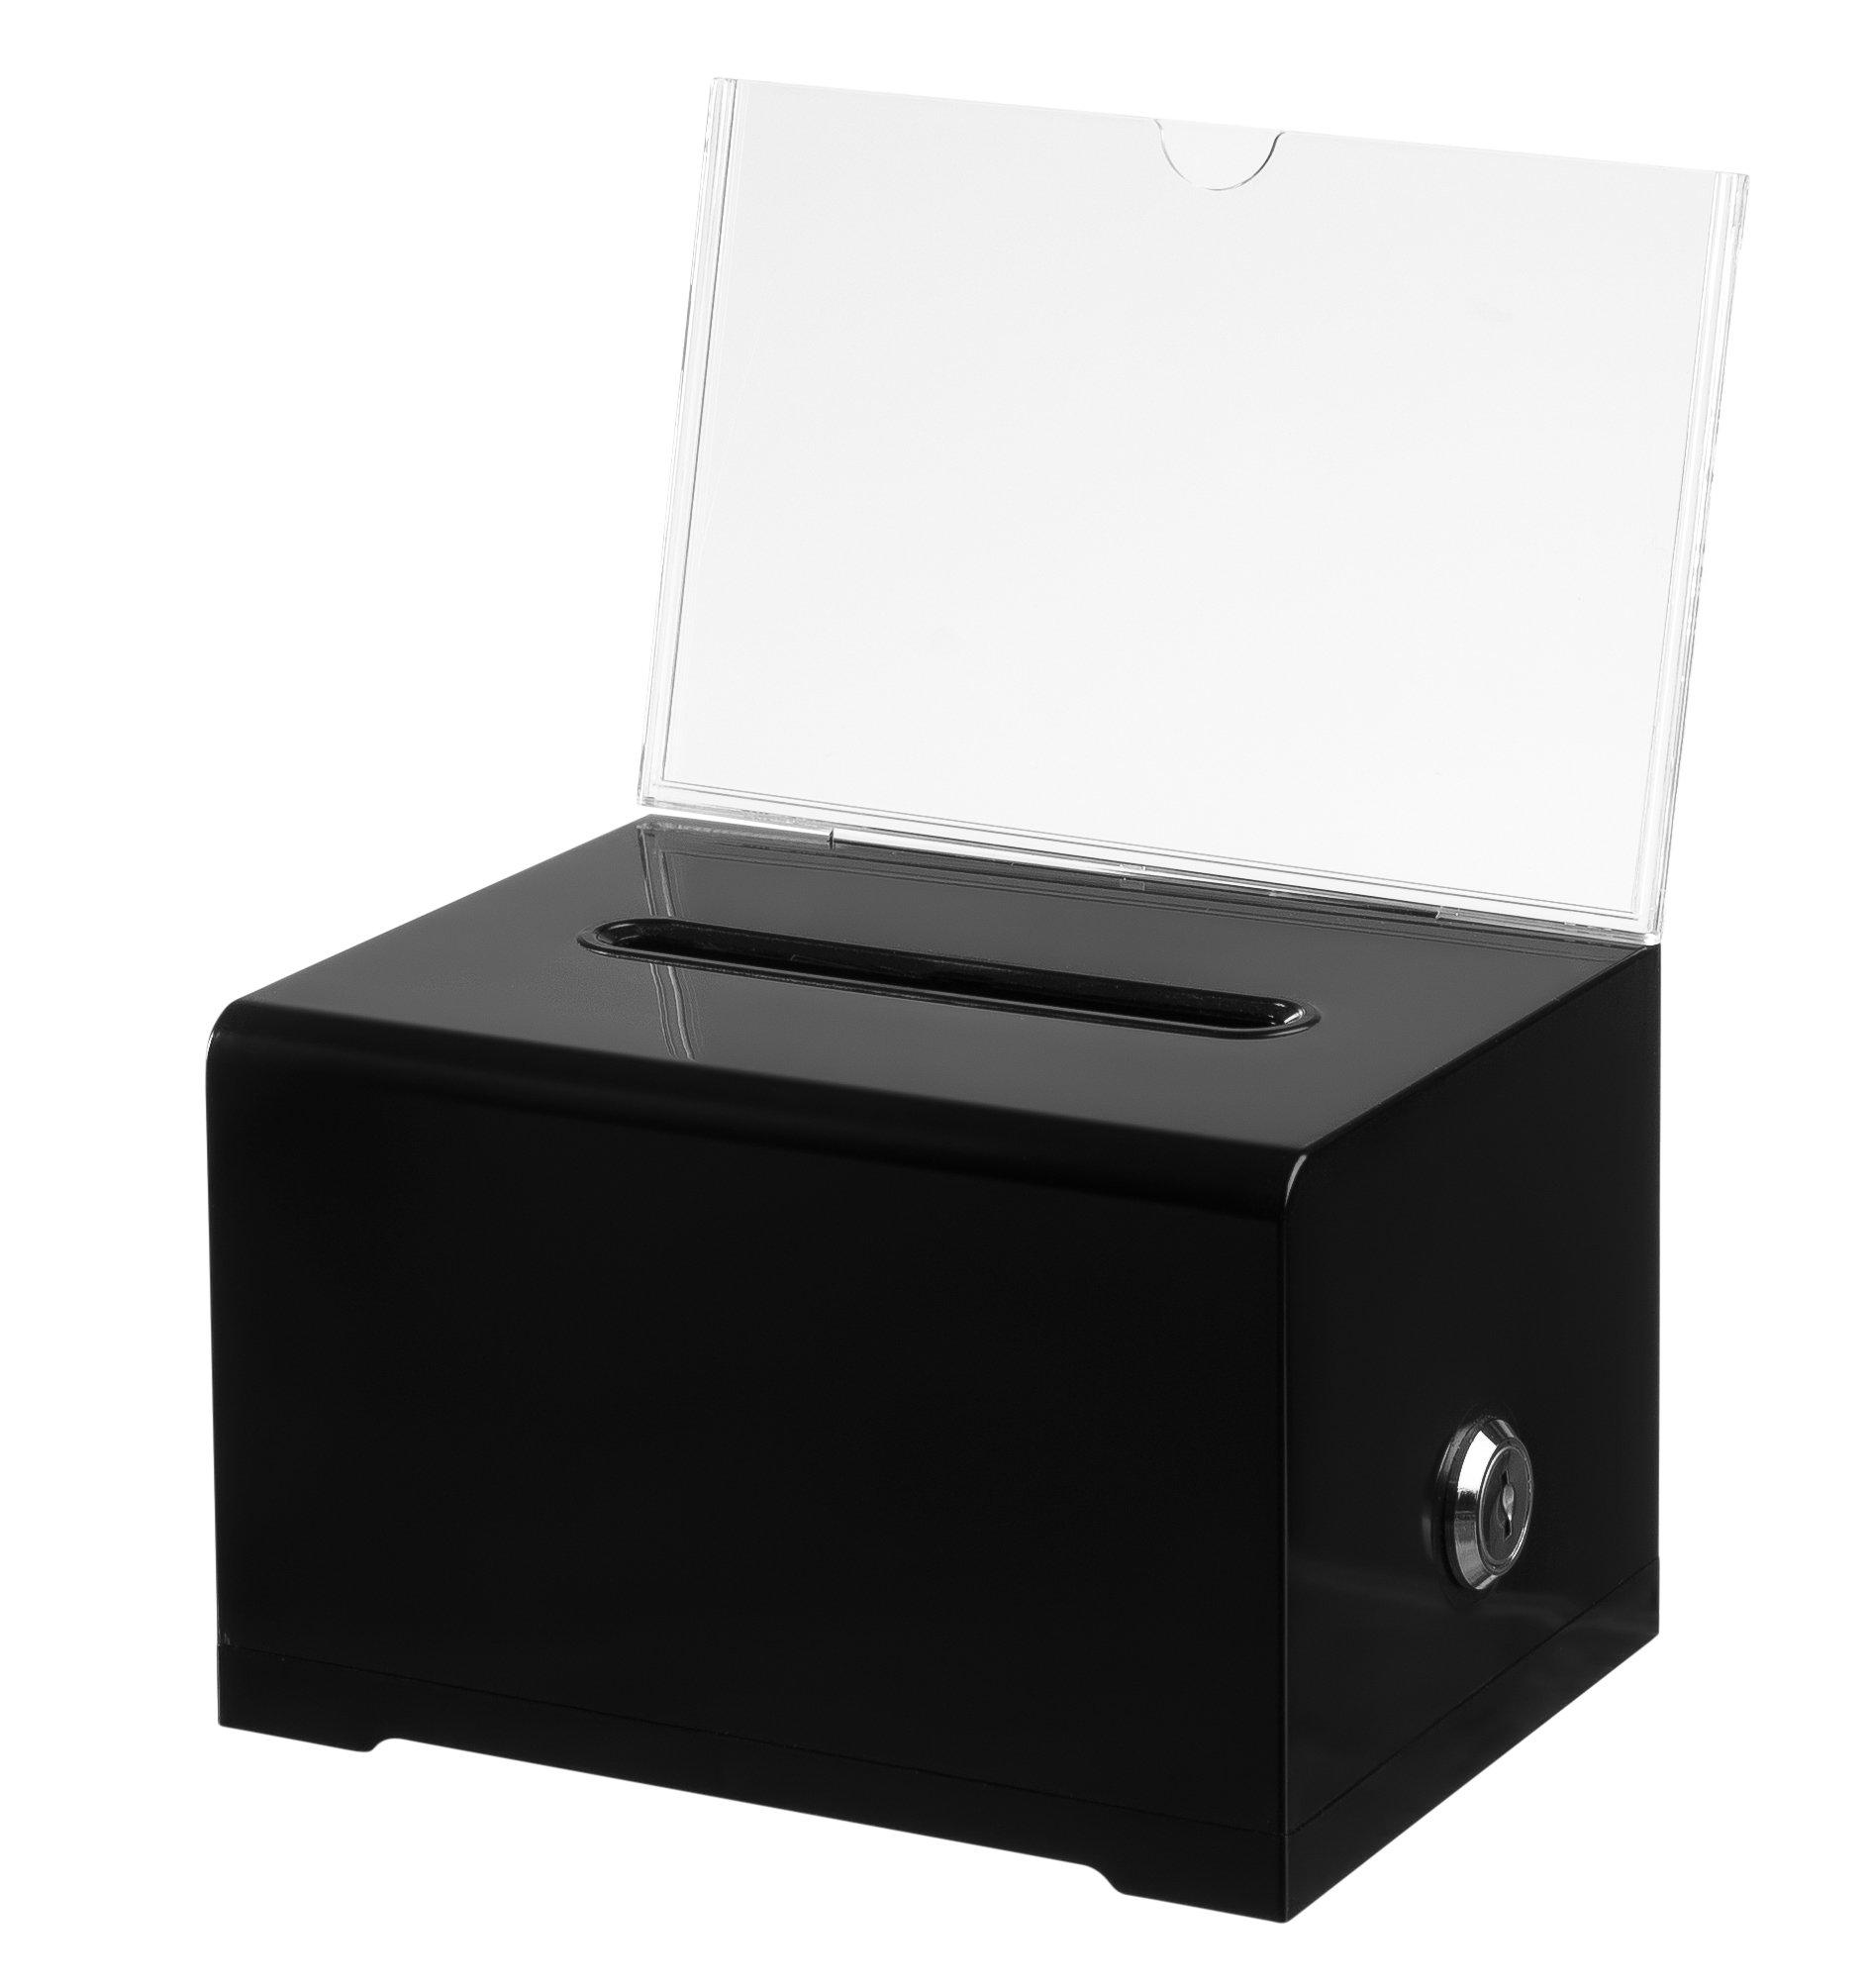 AdirOffice Acrylic Donation & Ballot Box With Lock (6.25'' x 4.5'' x 4'') - Black